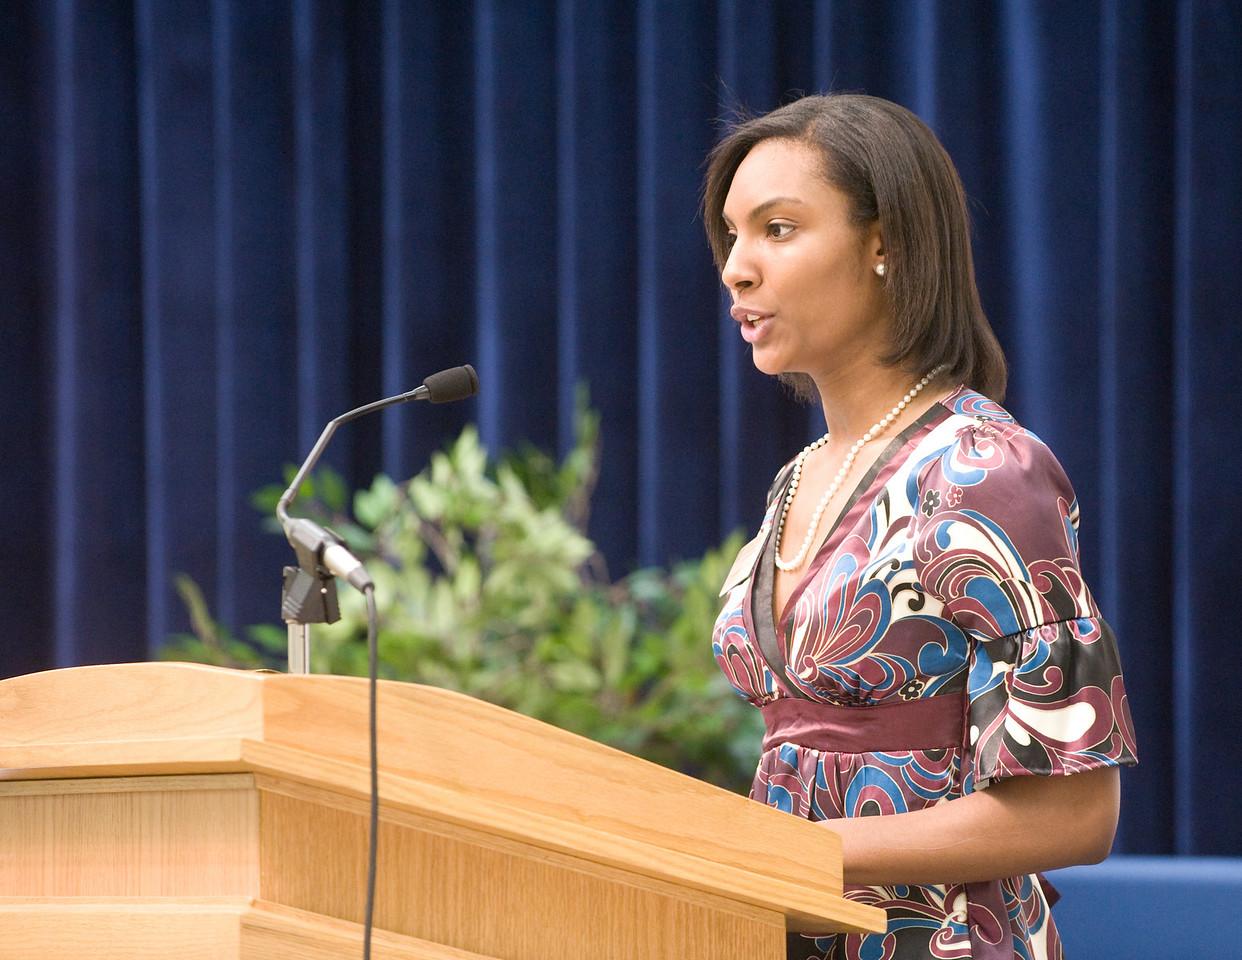 Stephanie Truly, president of the student alumni association